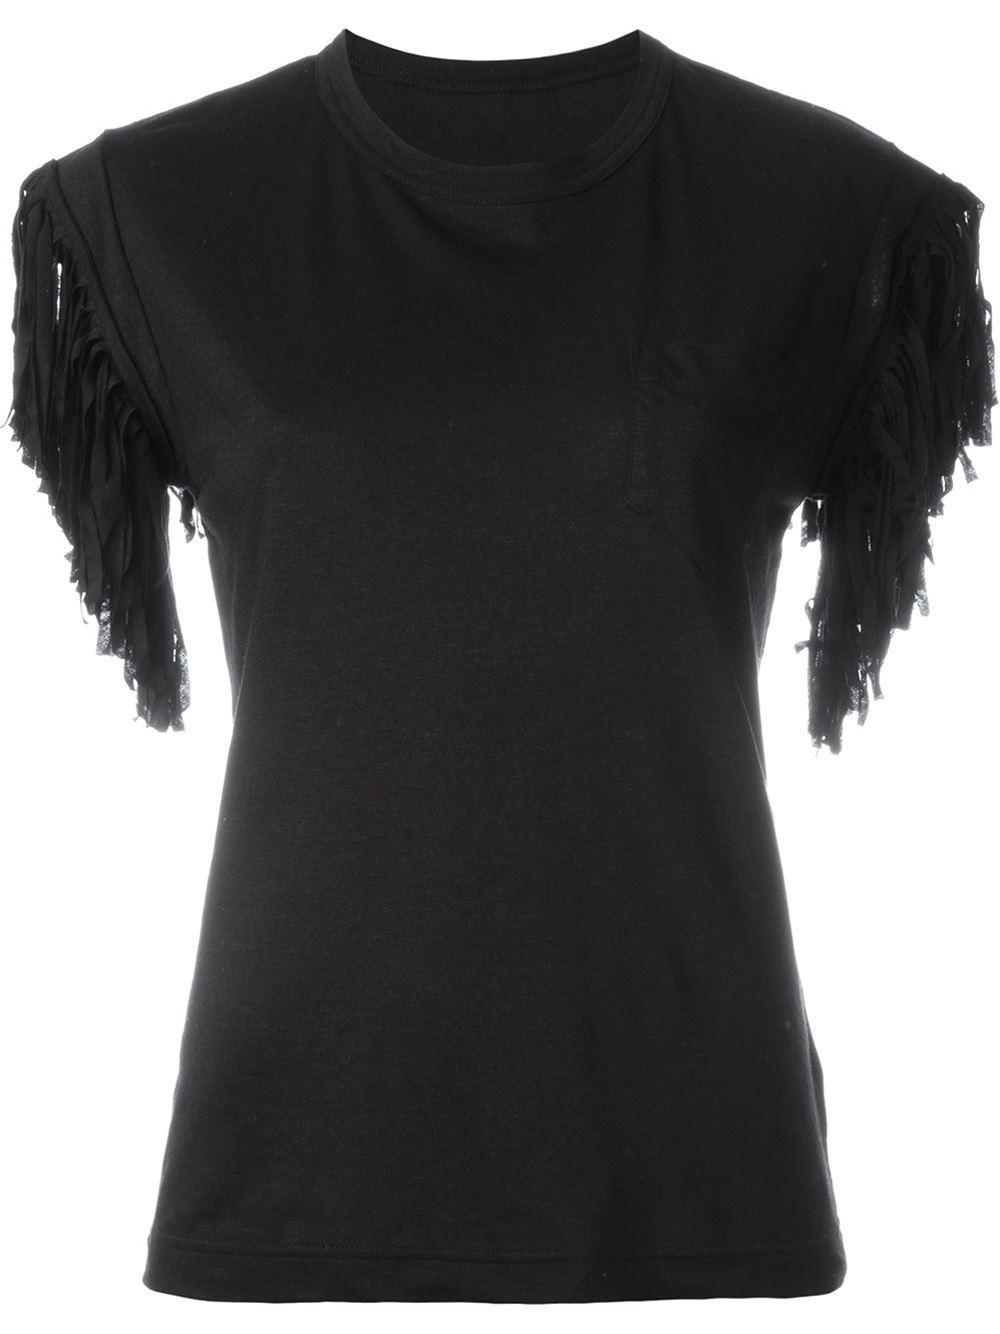 sacai fringed t shirt in black lyst. Black Bedroom Furniture Sets. Home Design Ideas